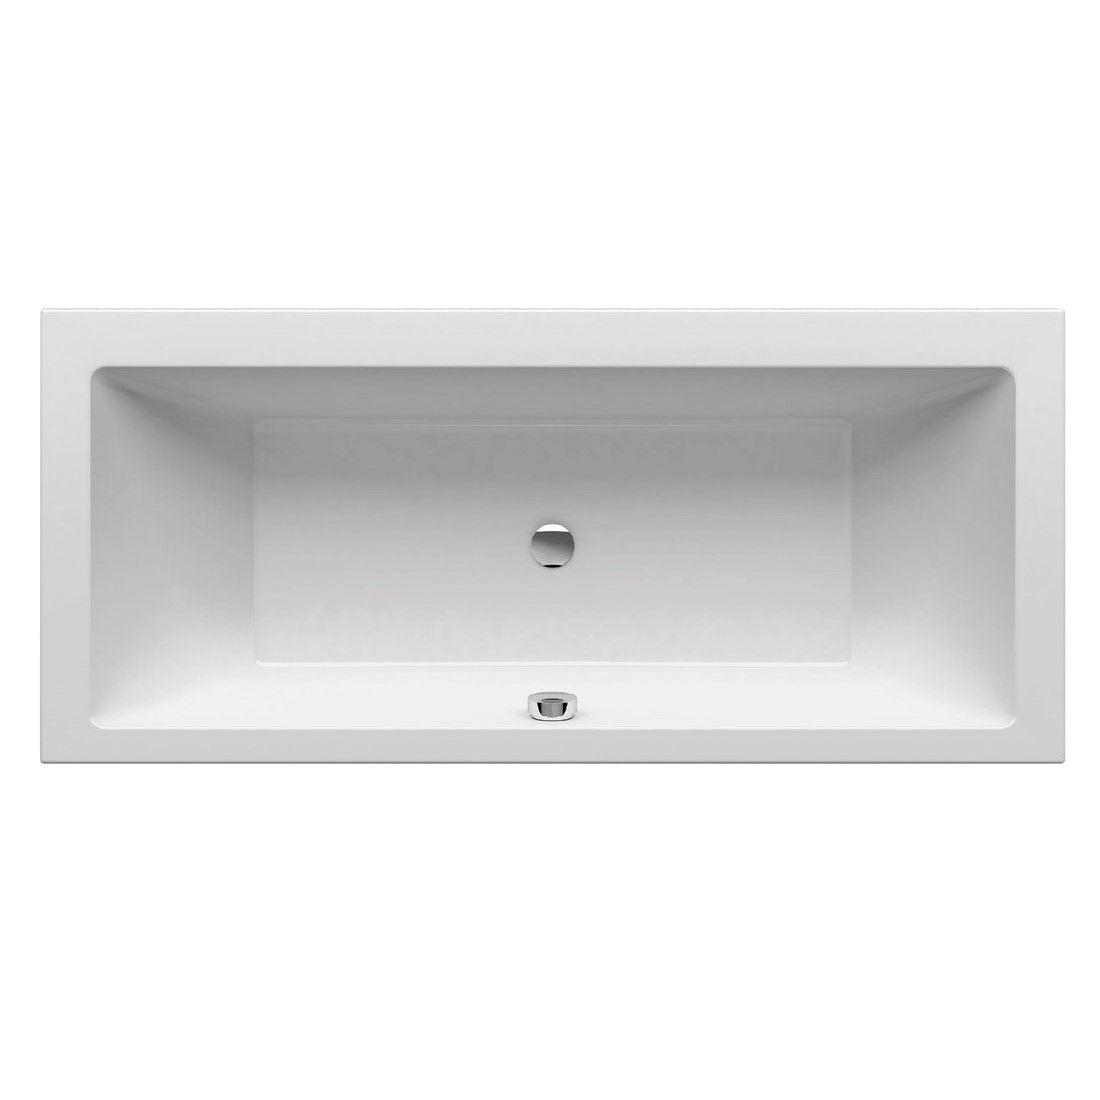 Прямоугольная ванна Ravak Formy 01 180x80 ФОТО